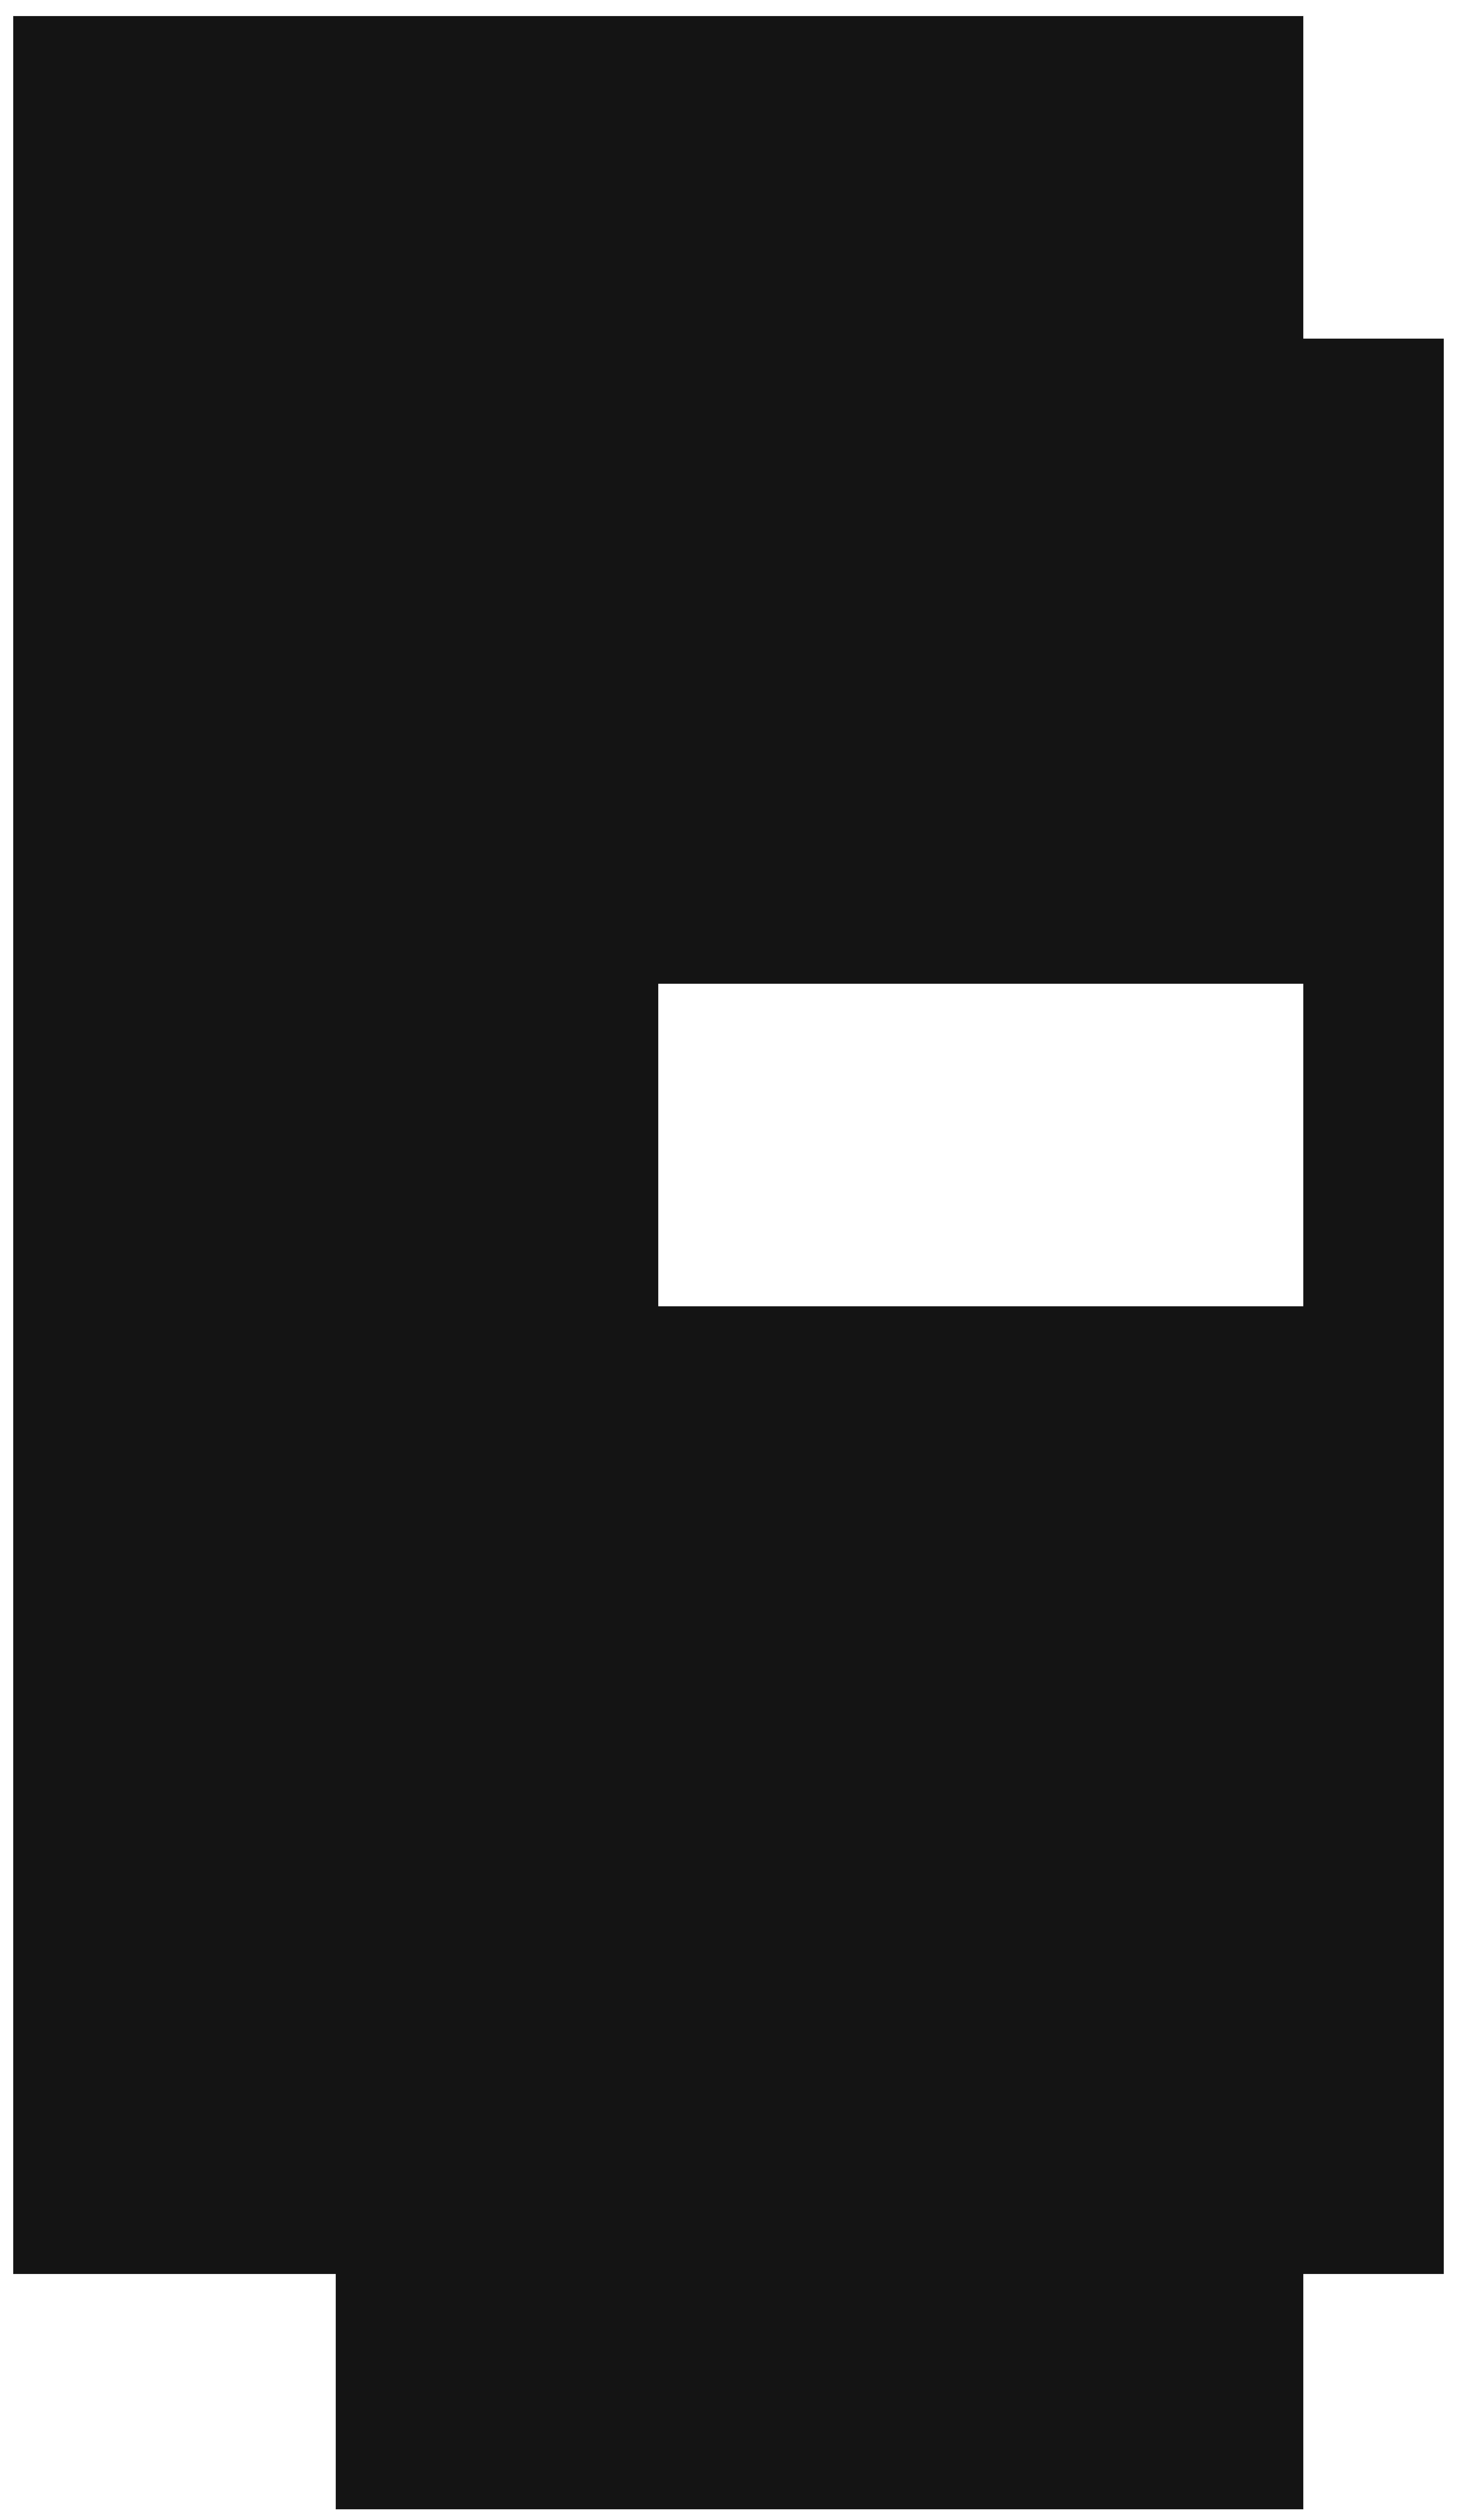 Beard clipart mustache. Silhouette moustache clip art